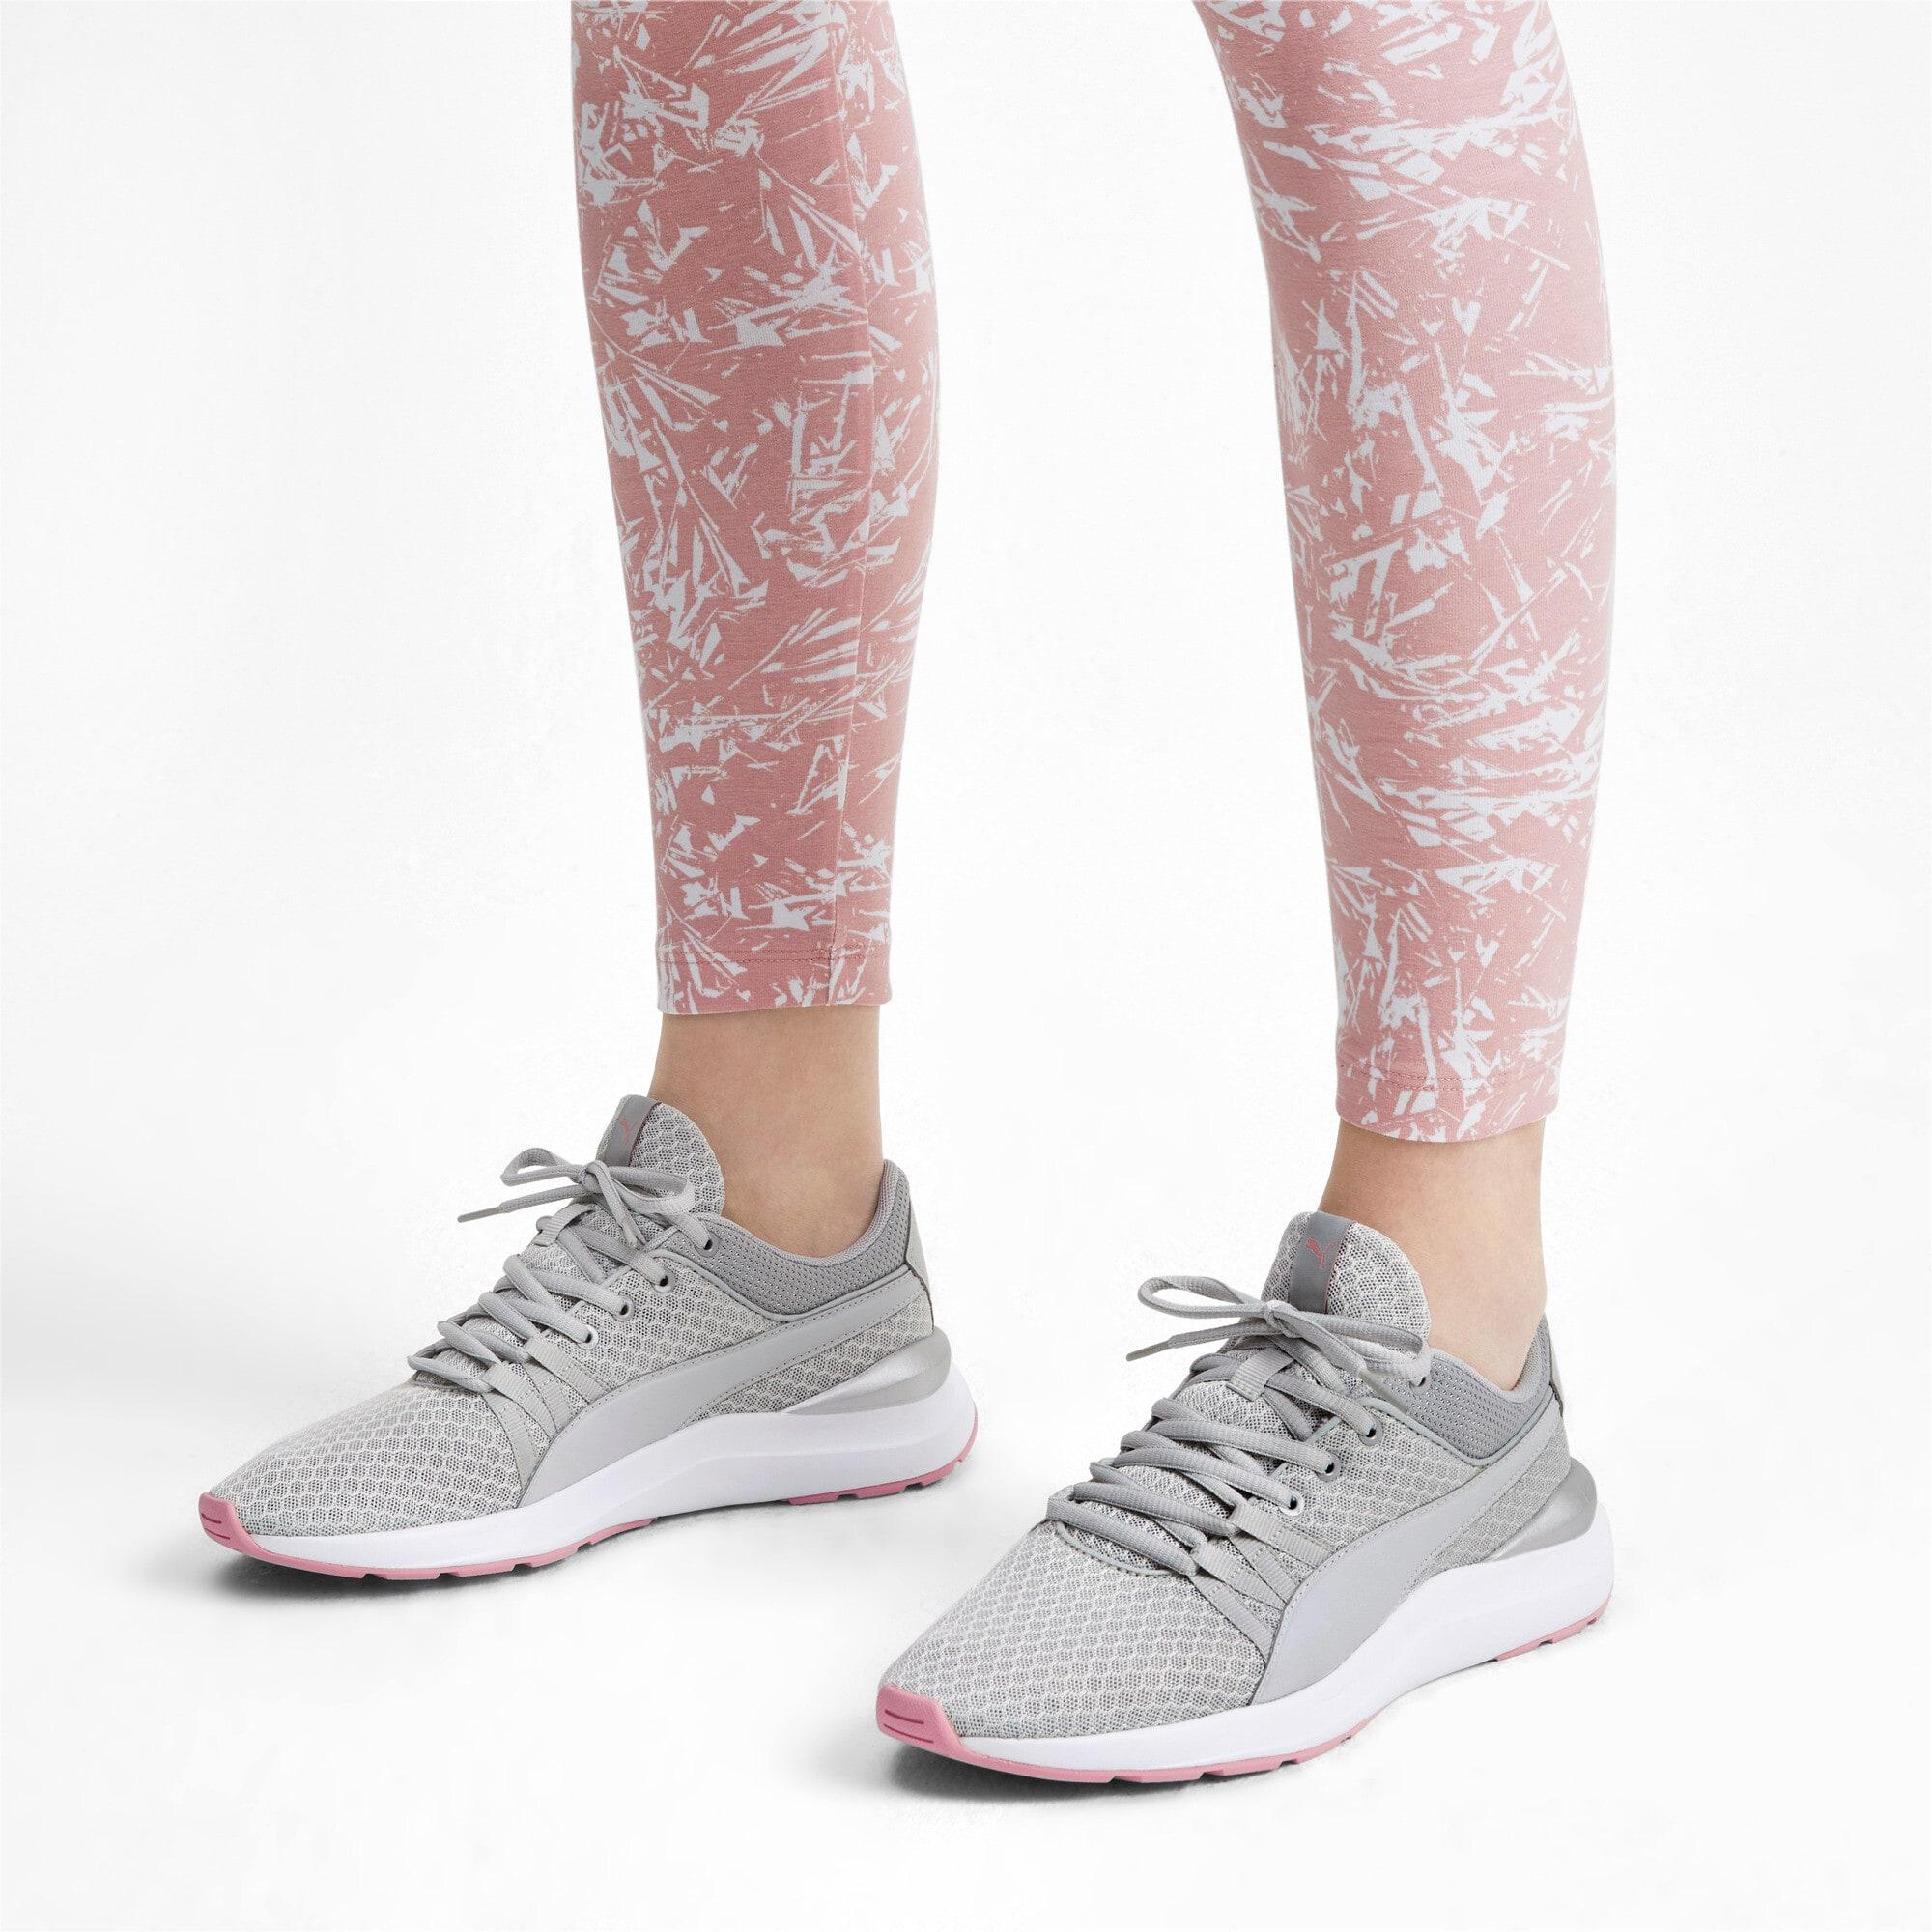 Adela Core Women's Sneakers